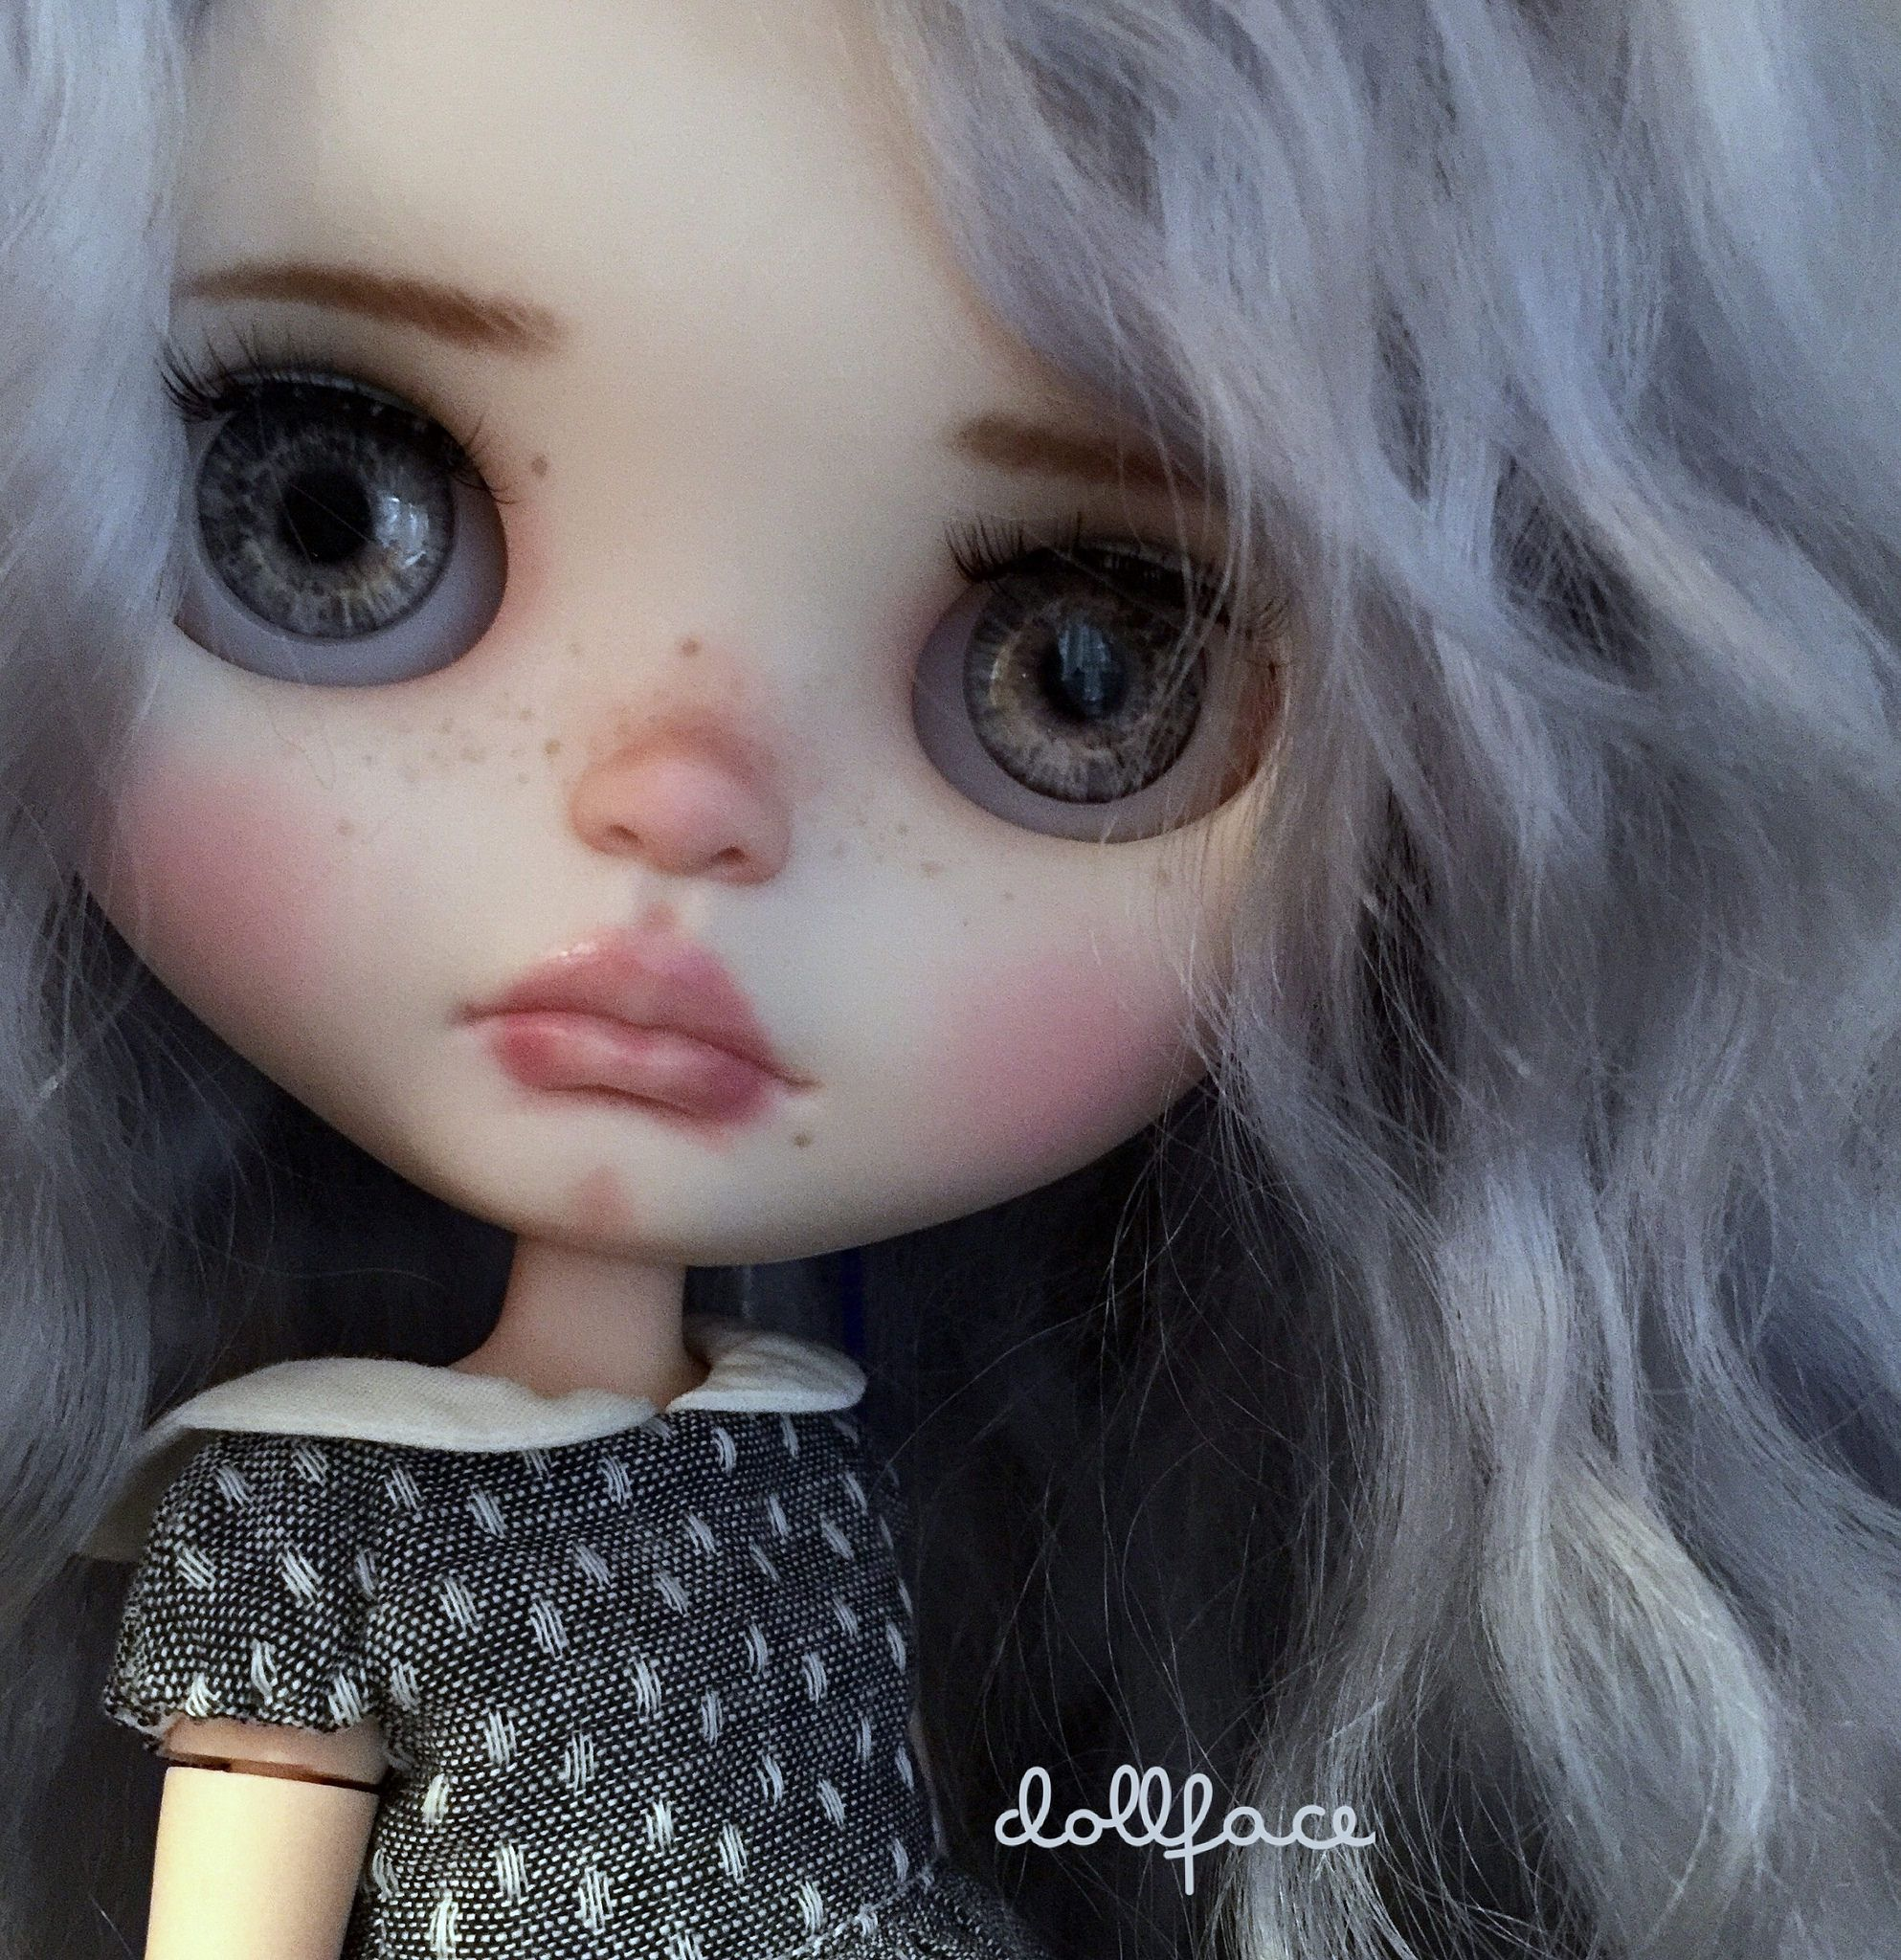 Anime In Netflix India: Maquillaje Fantasía Muñeca Ojos Grandes Big Eyes Doll